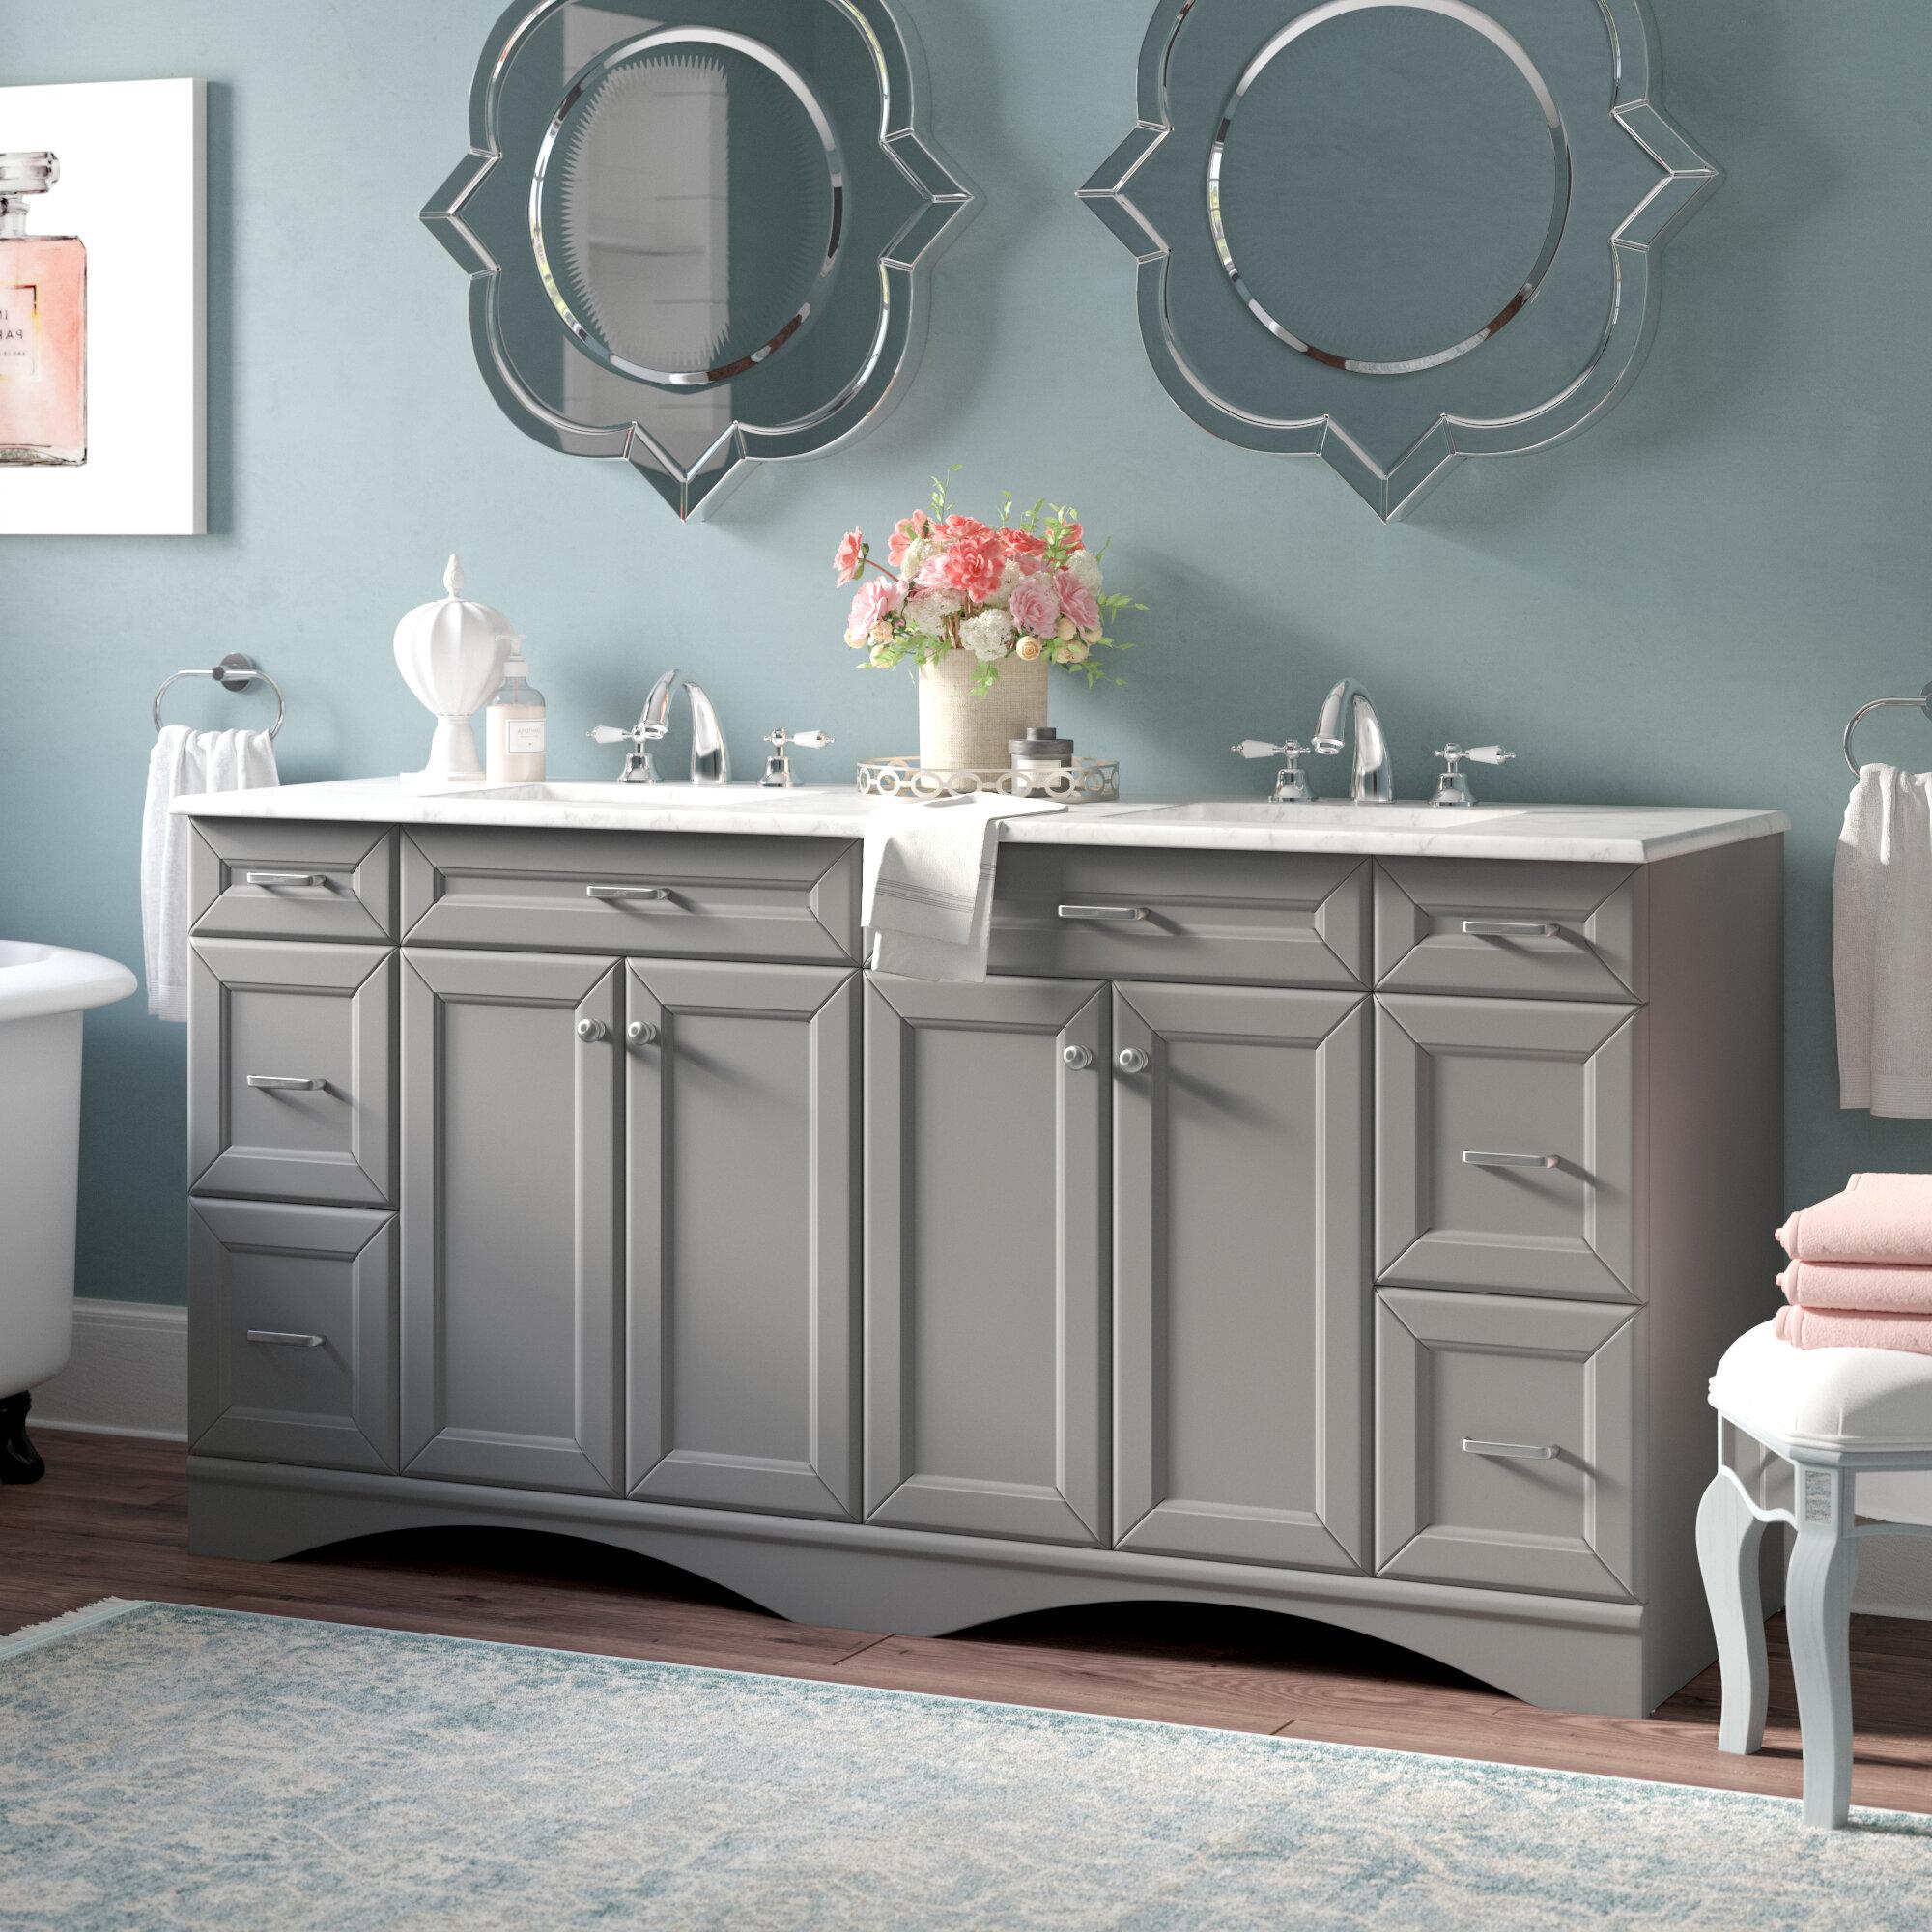 Super Jonina 72 Double Bathroom Vanity Set Interior Design Ideas Inesswwsoteloinfo